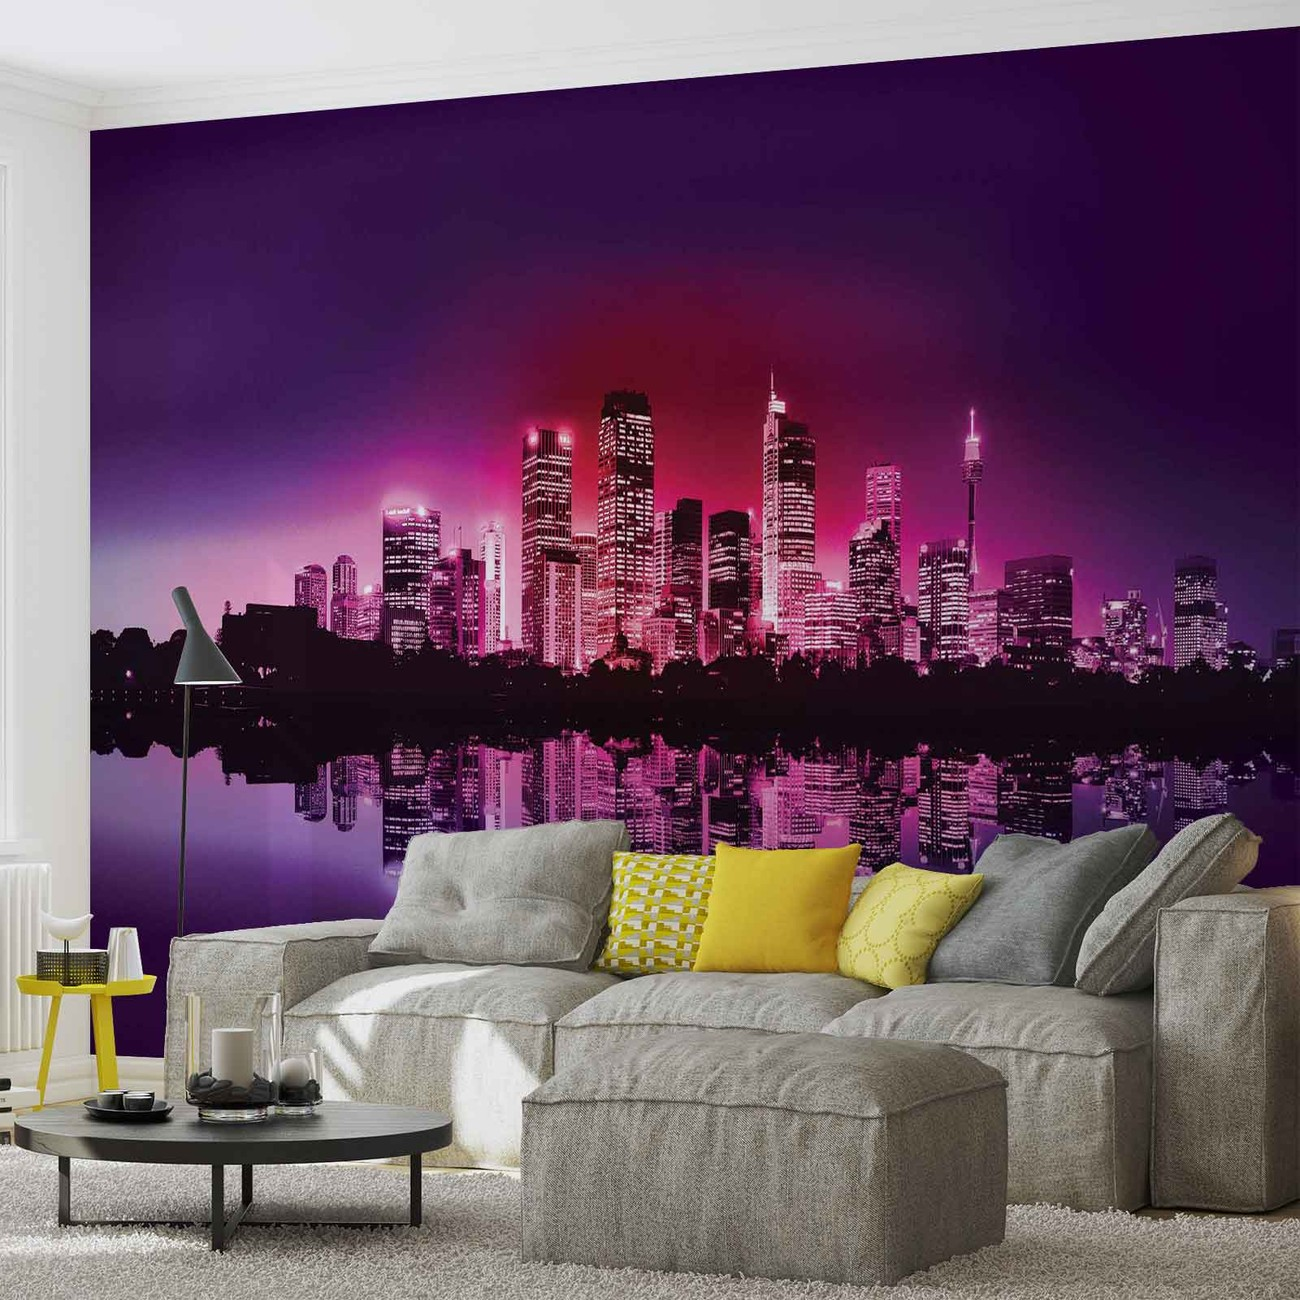 fototapete tapete stadt new york skyline bei europosters kostenloser versand. Black Bedroom Furniture Sets. Home Design Ideas